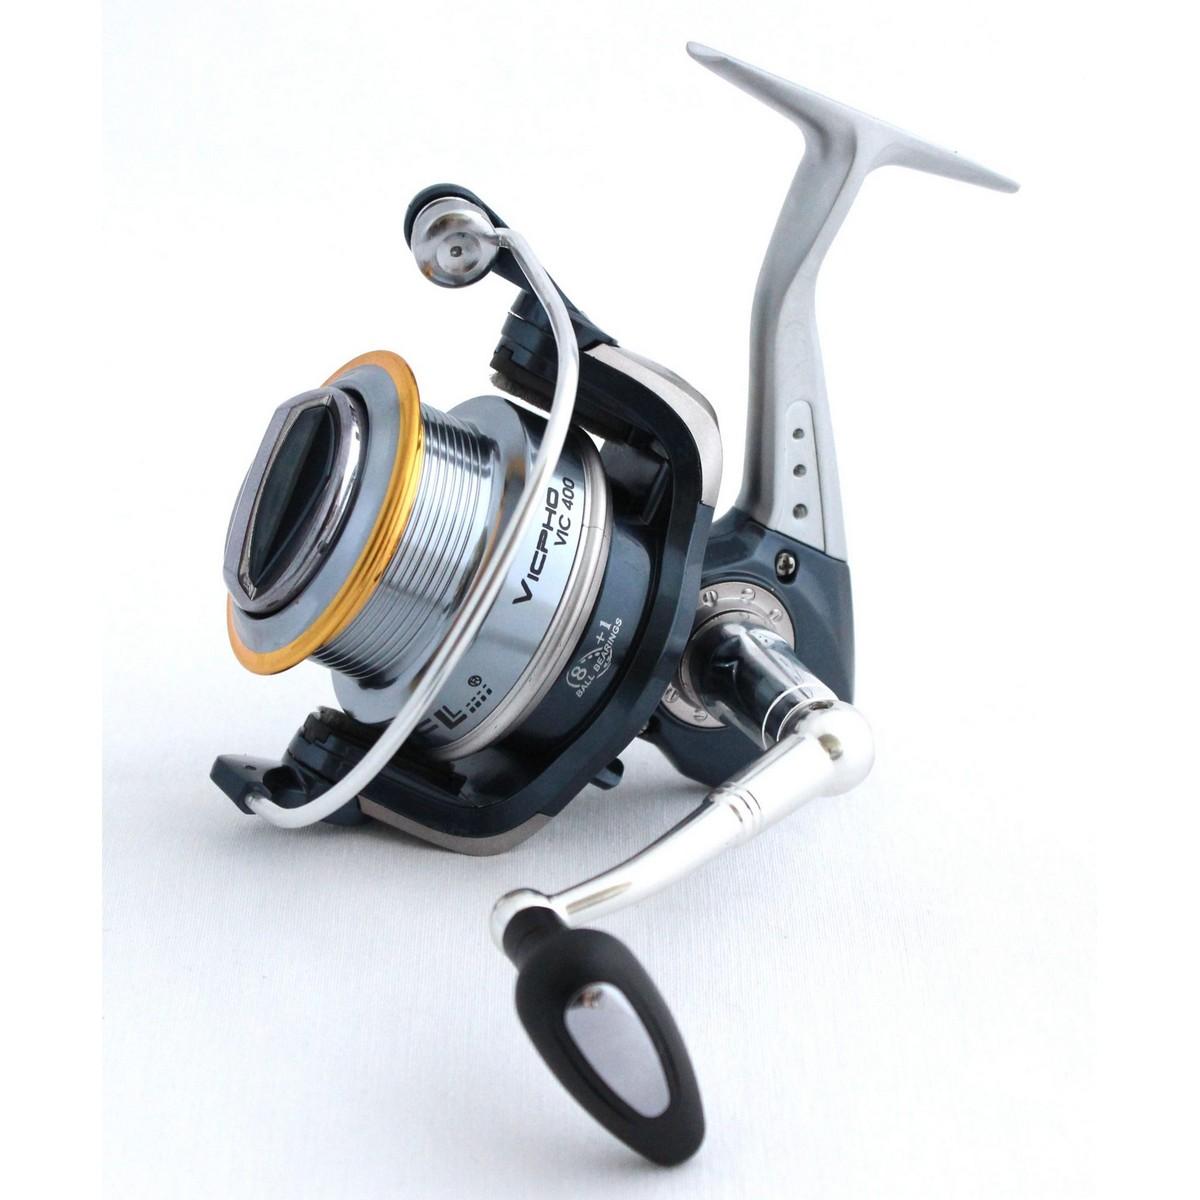 FL VIC-риболовна макара FL VIC